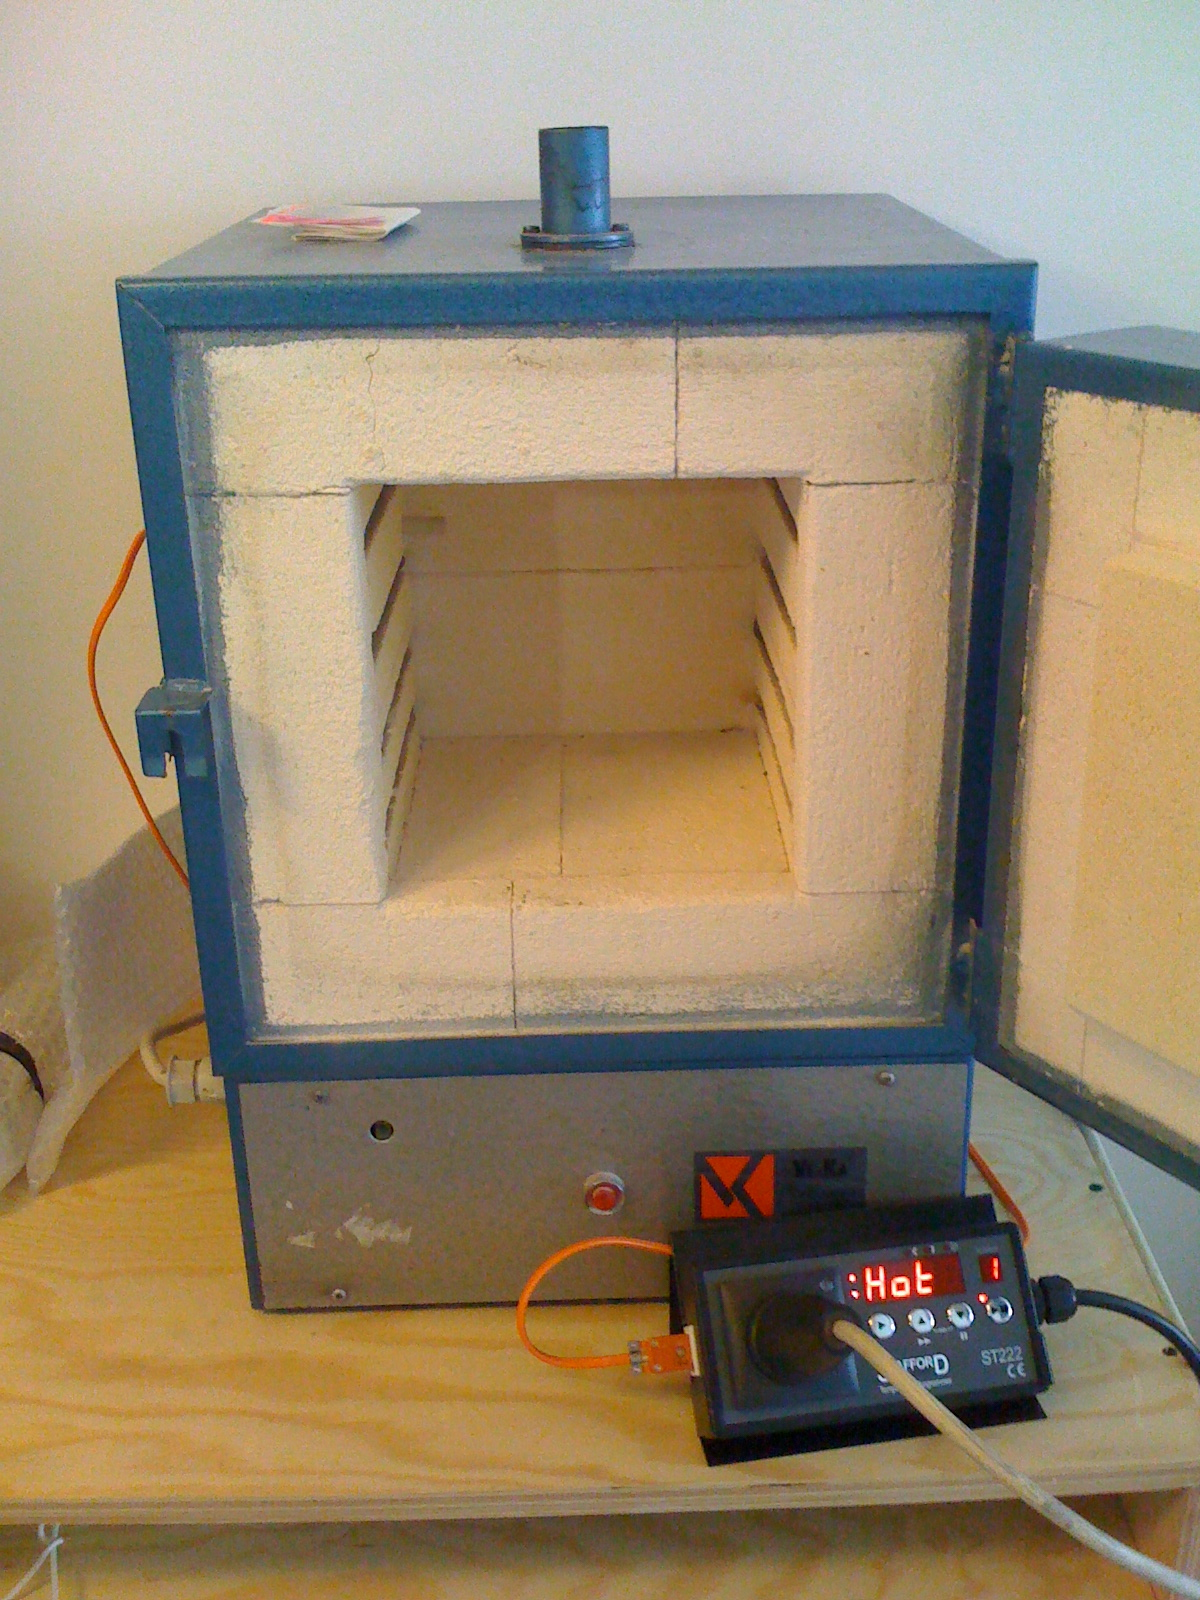 homemade electric kiln homemade ftempo. Black Bedroom Furniture Sets. Home Design Ideas